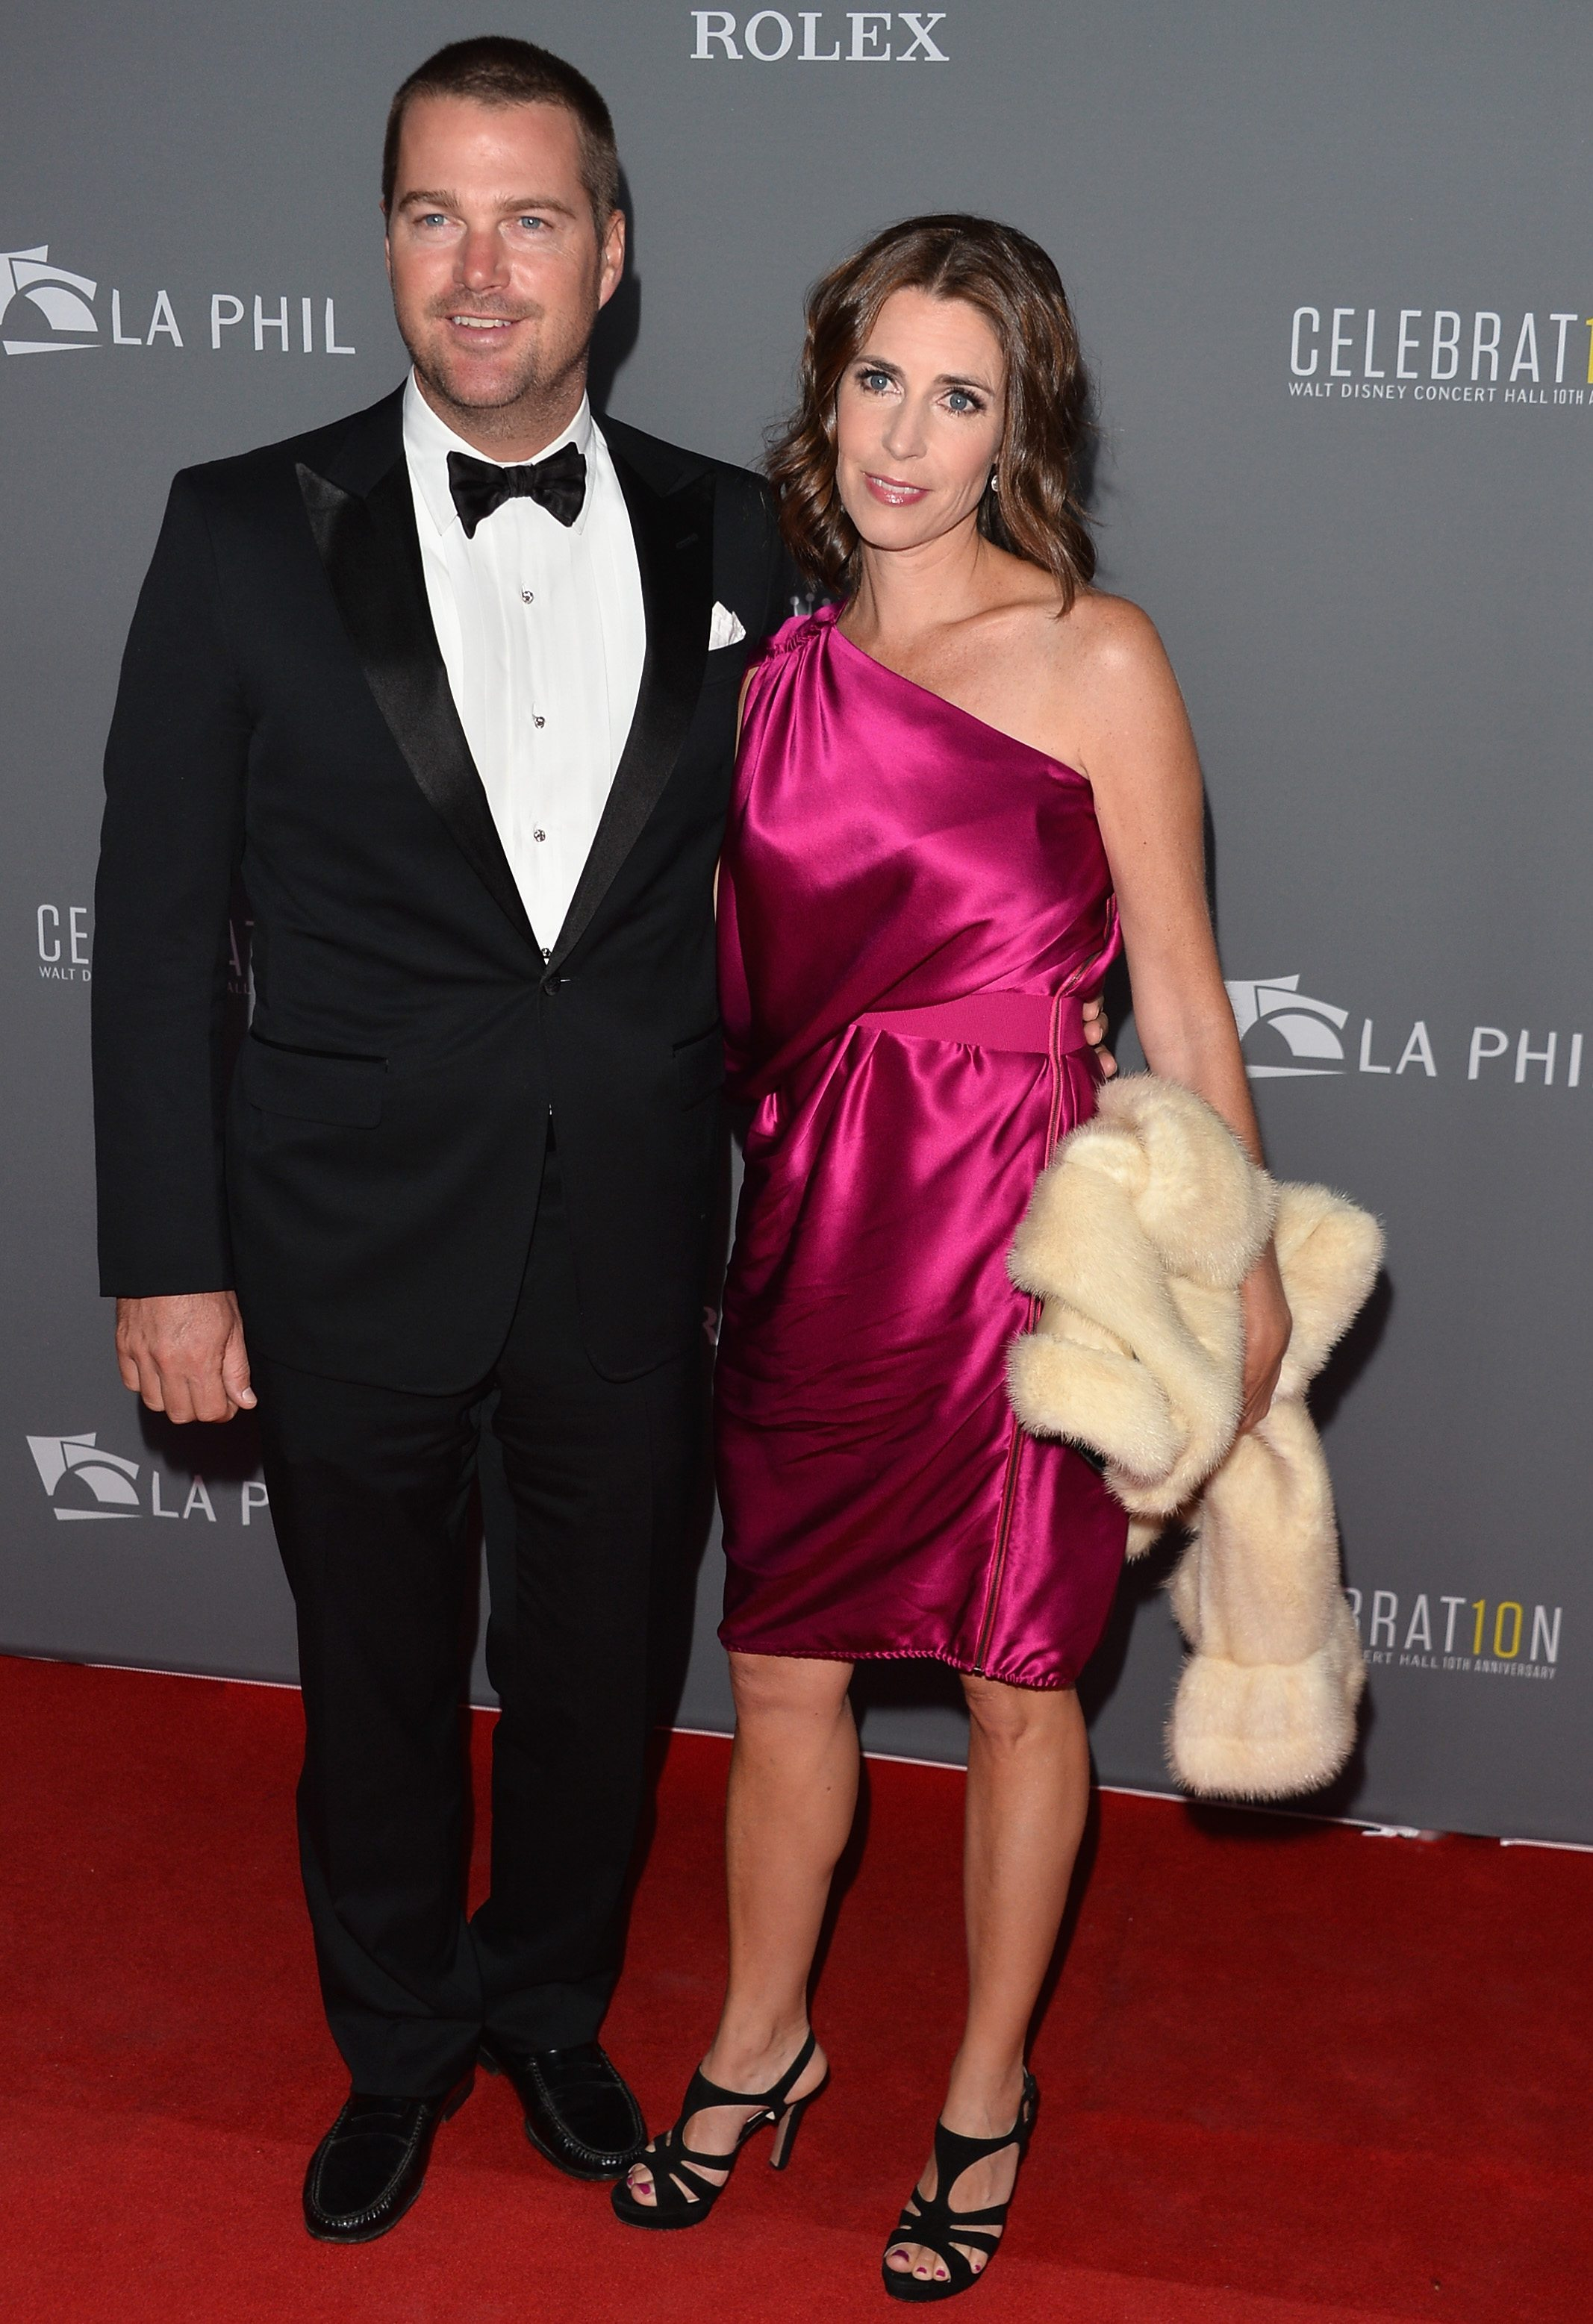 Chris O'Donnell and Caroline Fentress